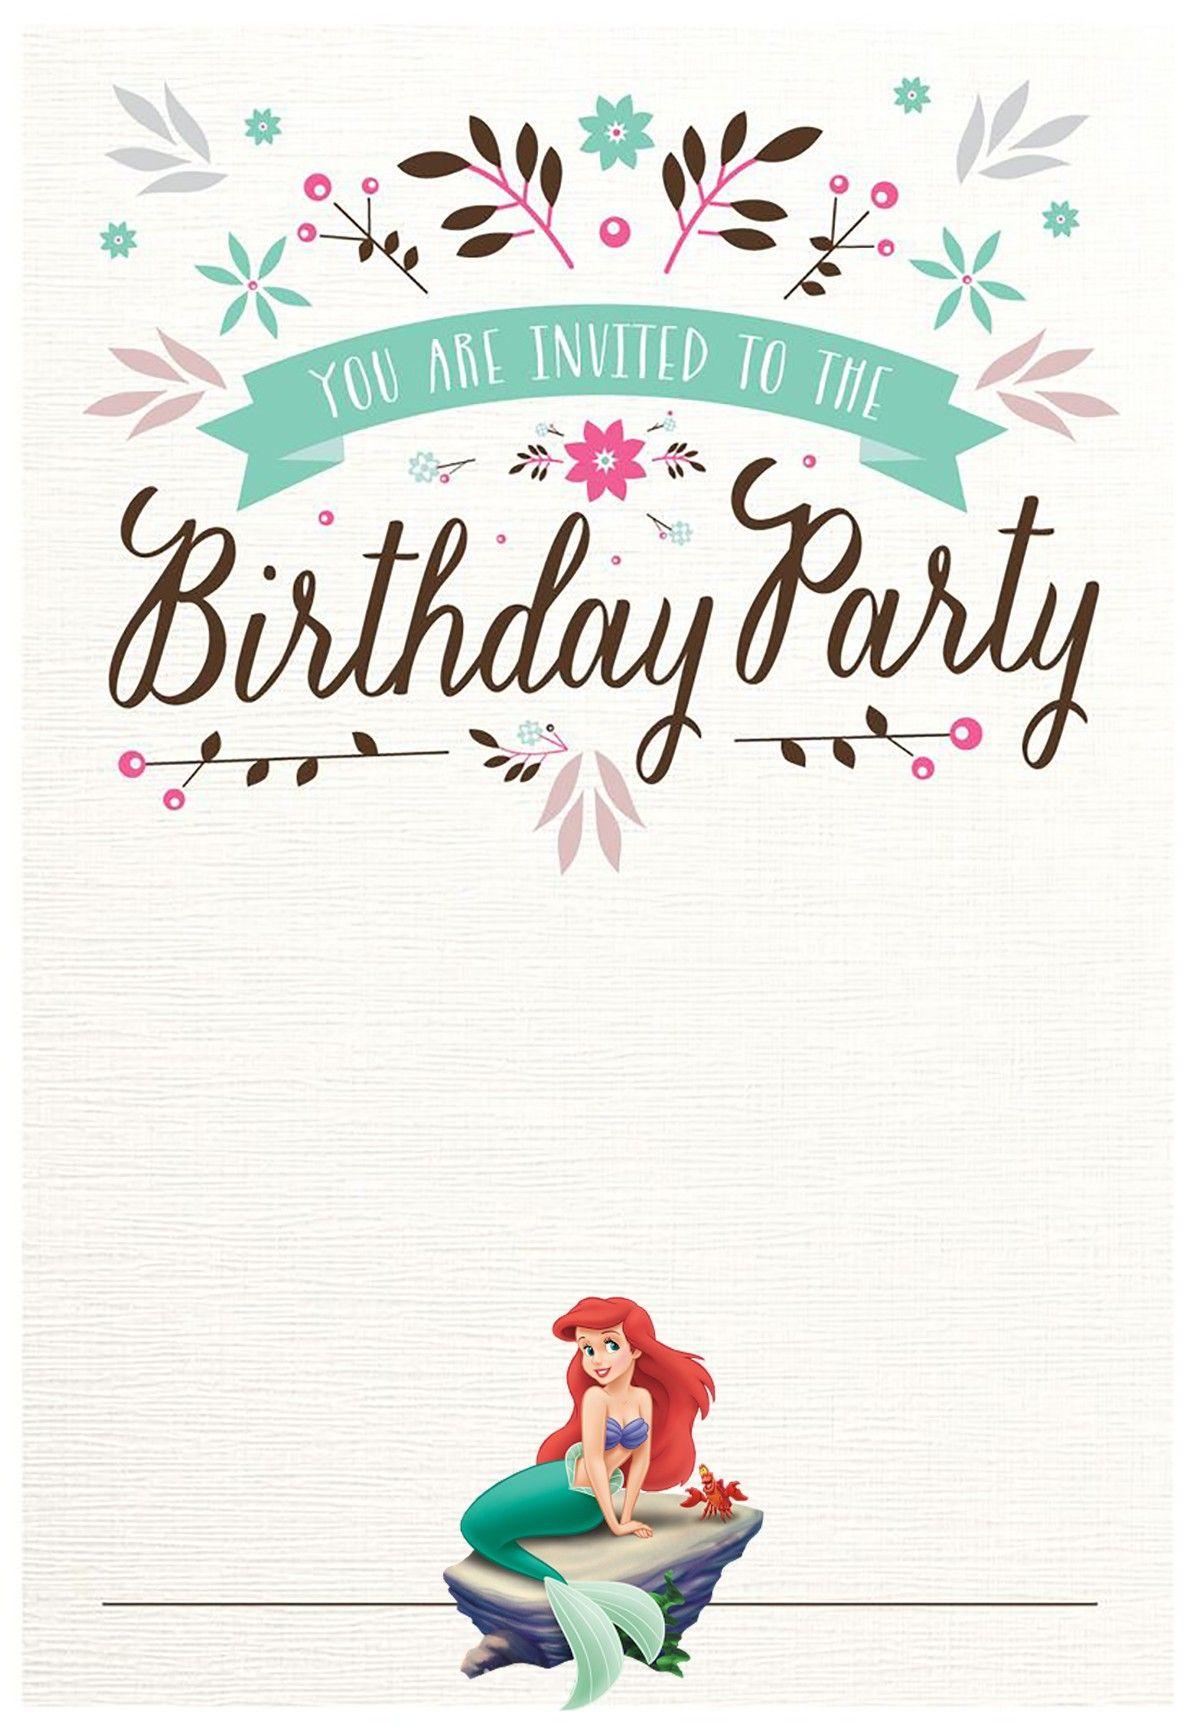 Little Mermaid Birthday Party Invitation Printable In 2019